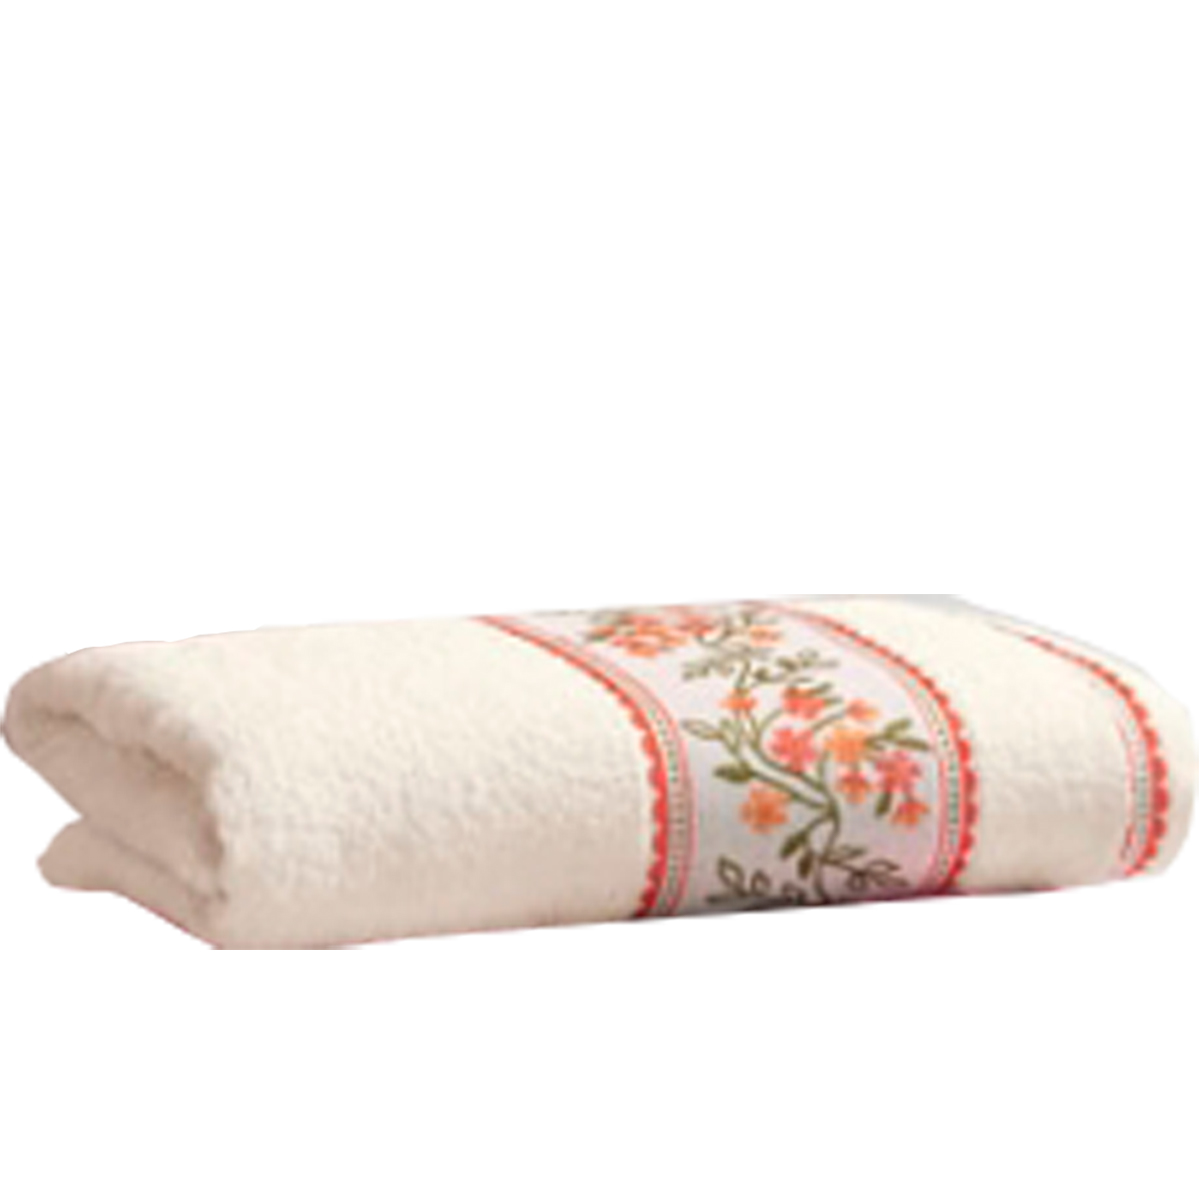 Toalha de Banho Candy Creme Lufamar